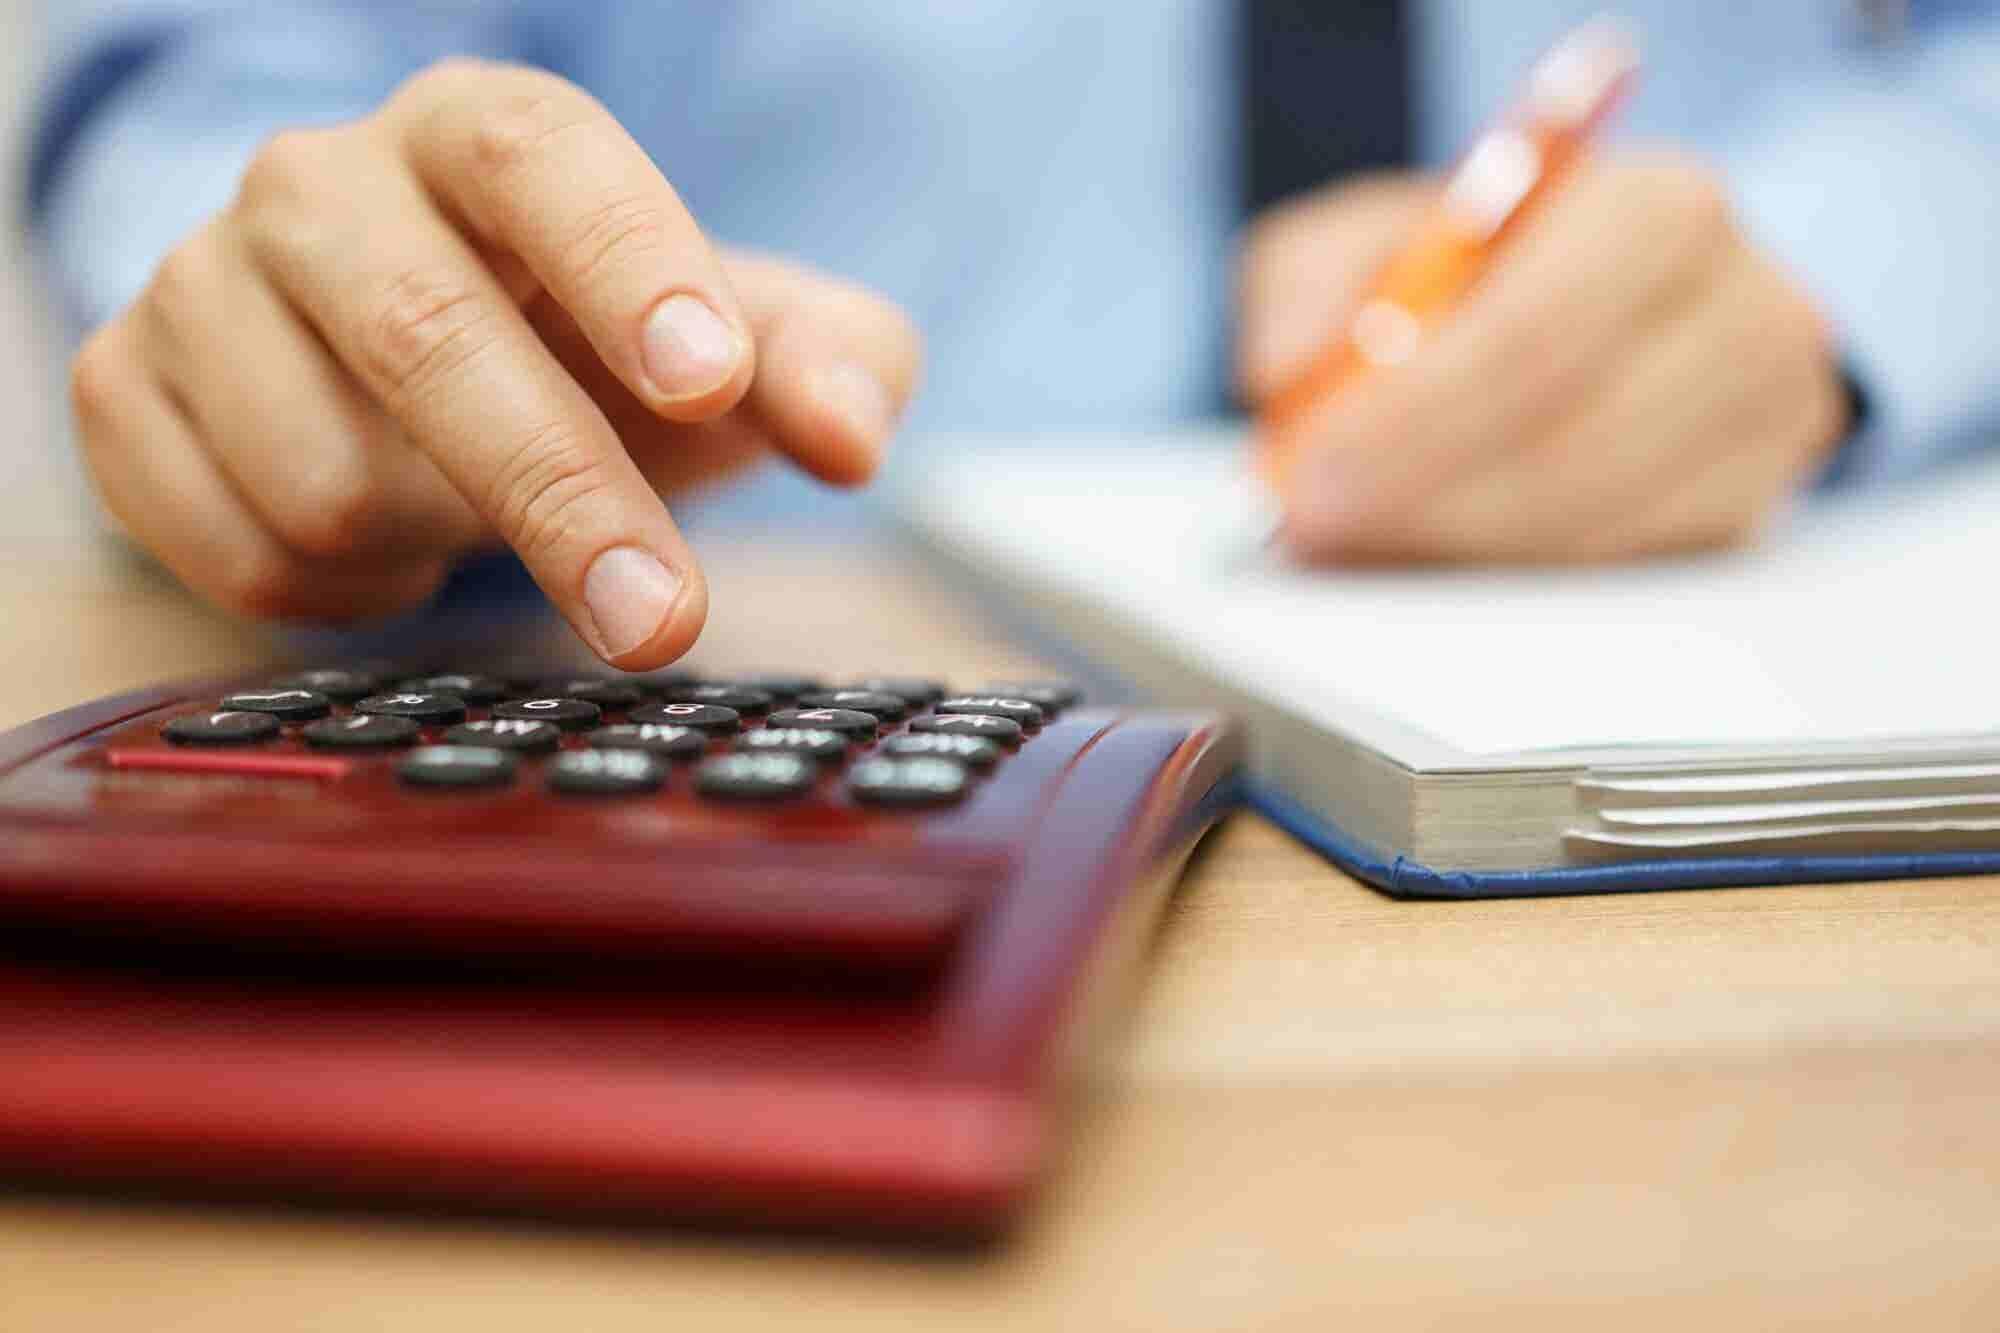 Free Webinar: Smart Solutions to Manage Accounts Payable Like a Pro